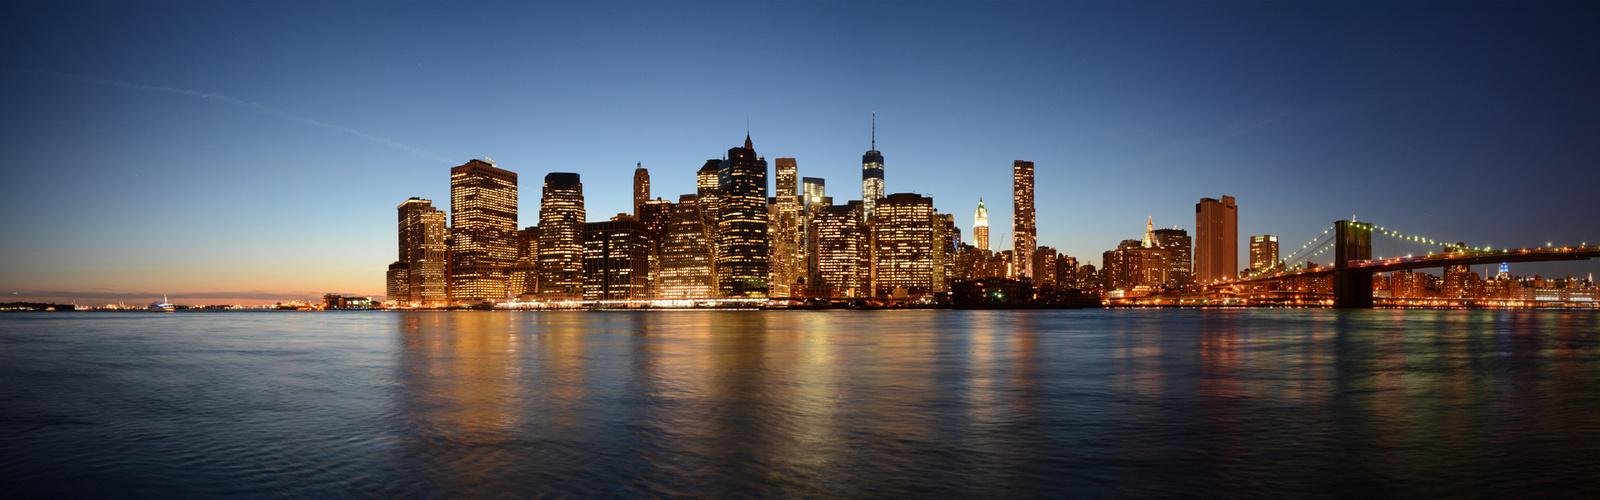 Skyline am Spätabend